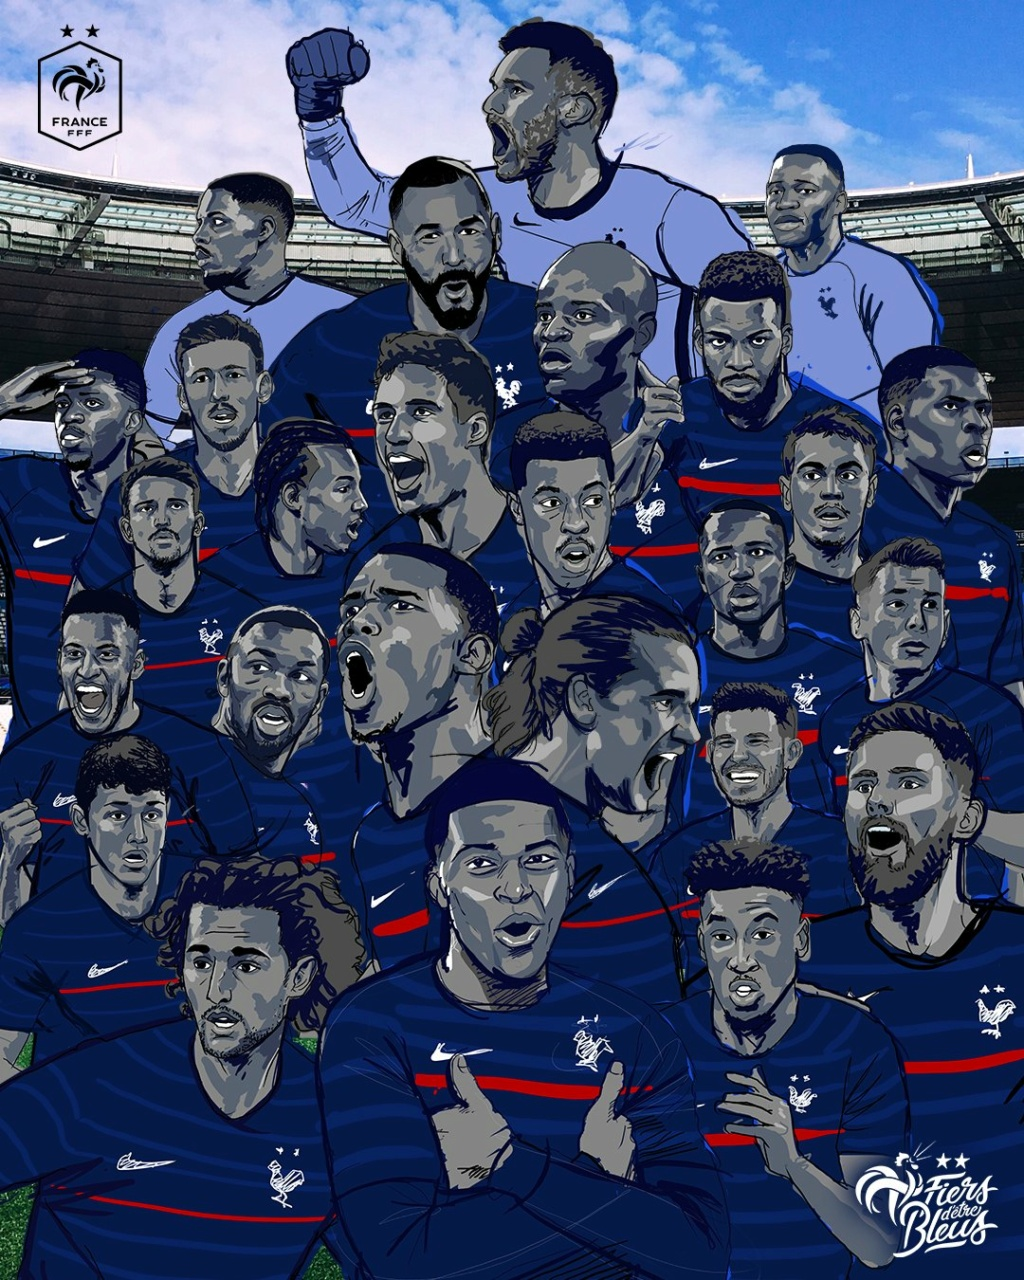 Eurocopa 2021: כיום ברית הגורל נגד אידיוטים נגד הסתגרות - Página 5 E1sjso10